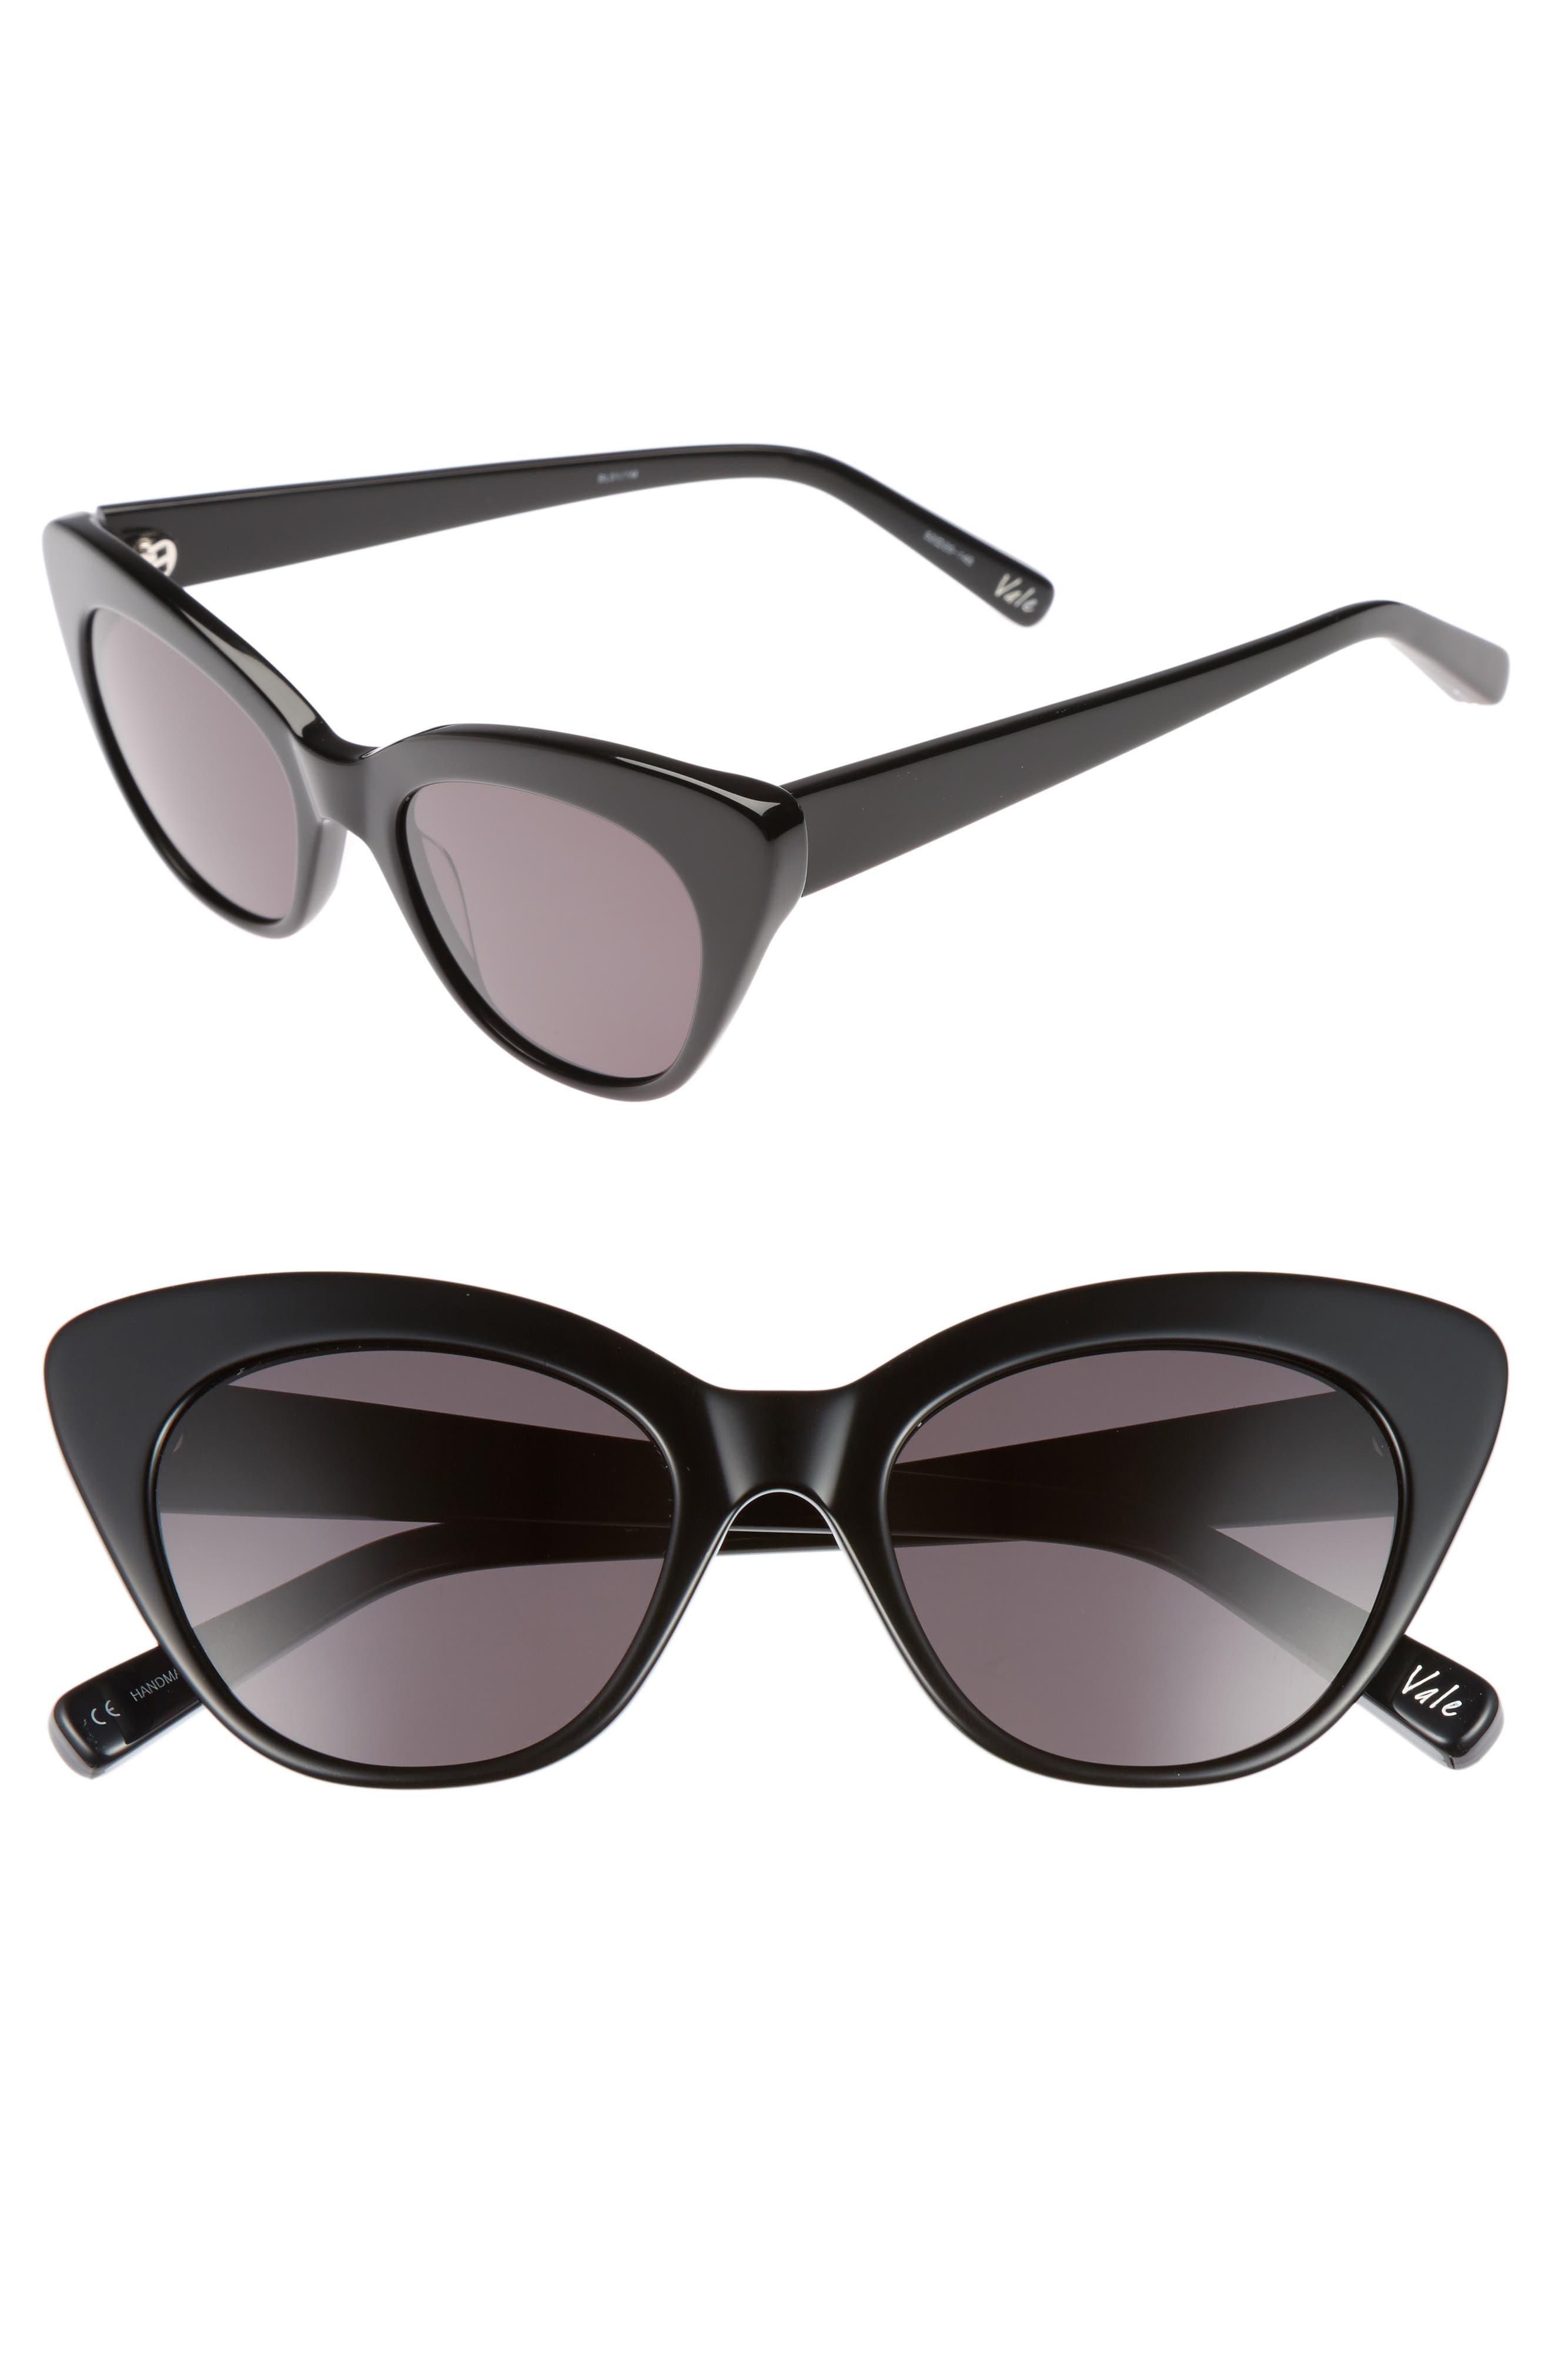 ELIZABETH AND JAMES Vale 52mm Cat Eye Sunglasses, Main, color, 020